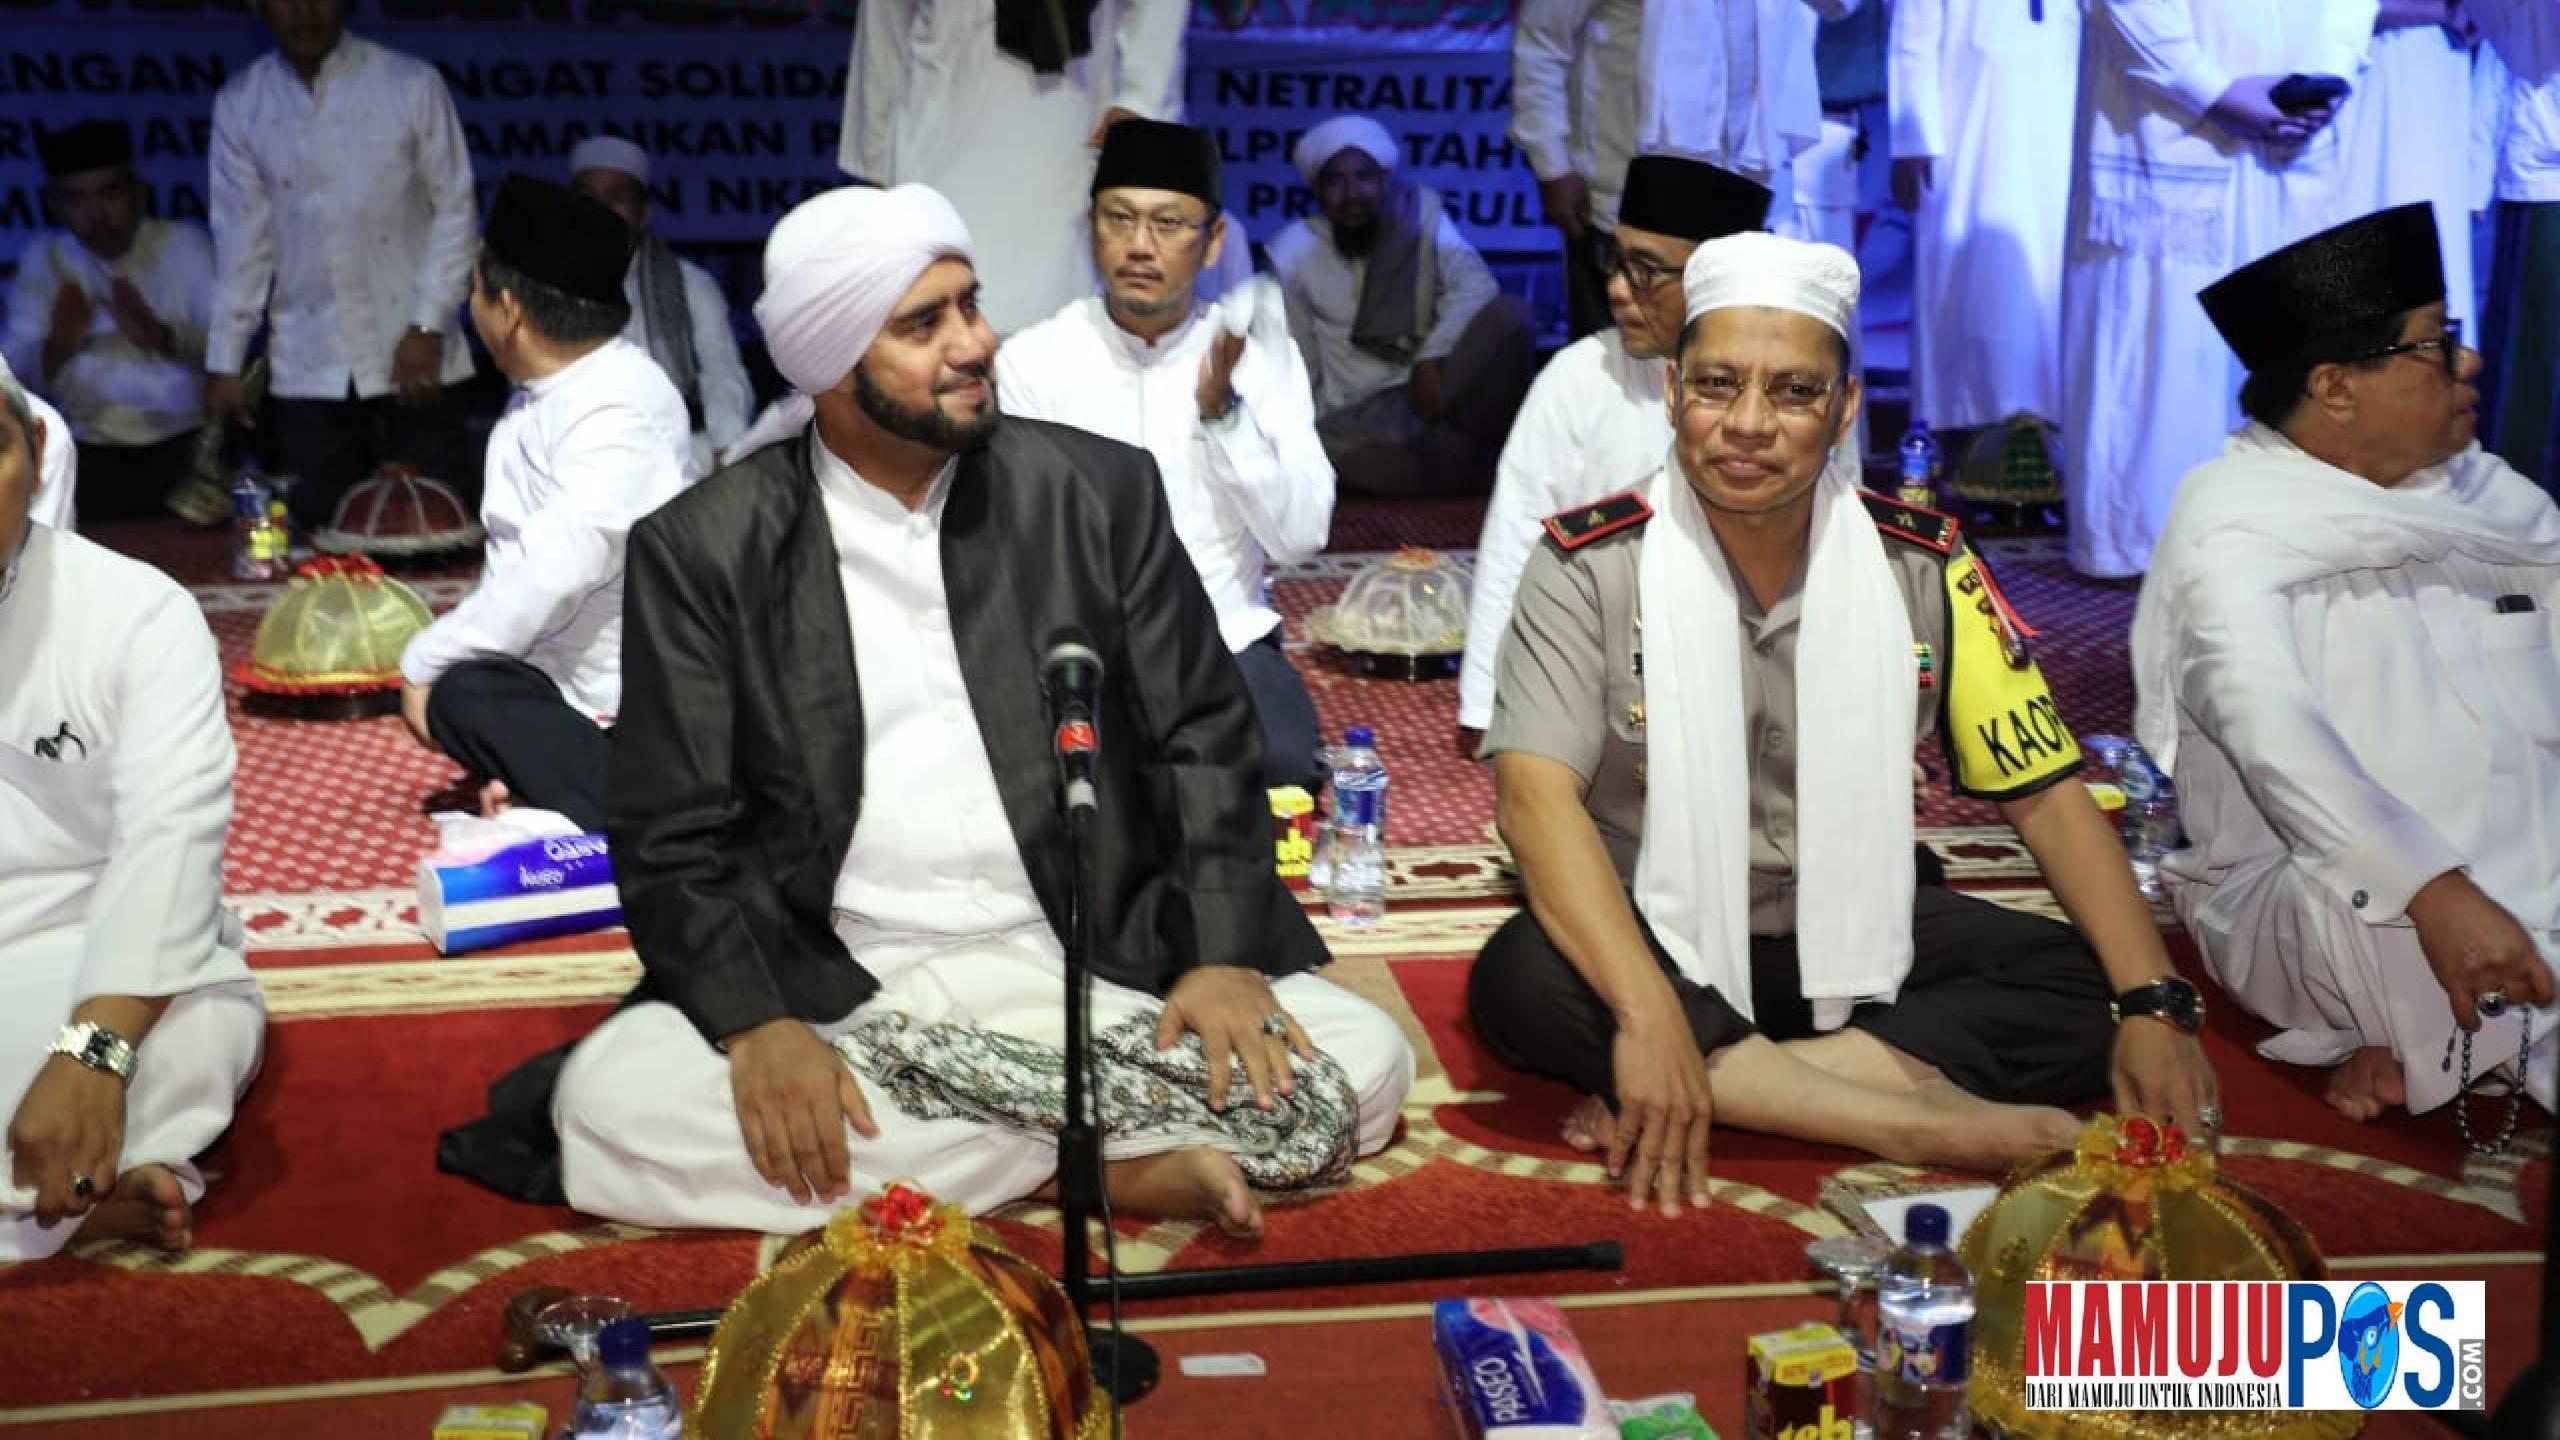 Gambar Mantan Gubernur Sulbar Dua Periode AAS Turut Hadiri Shalawat Akbar